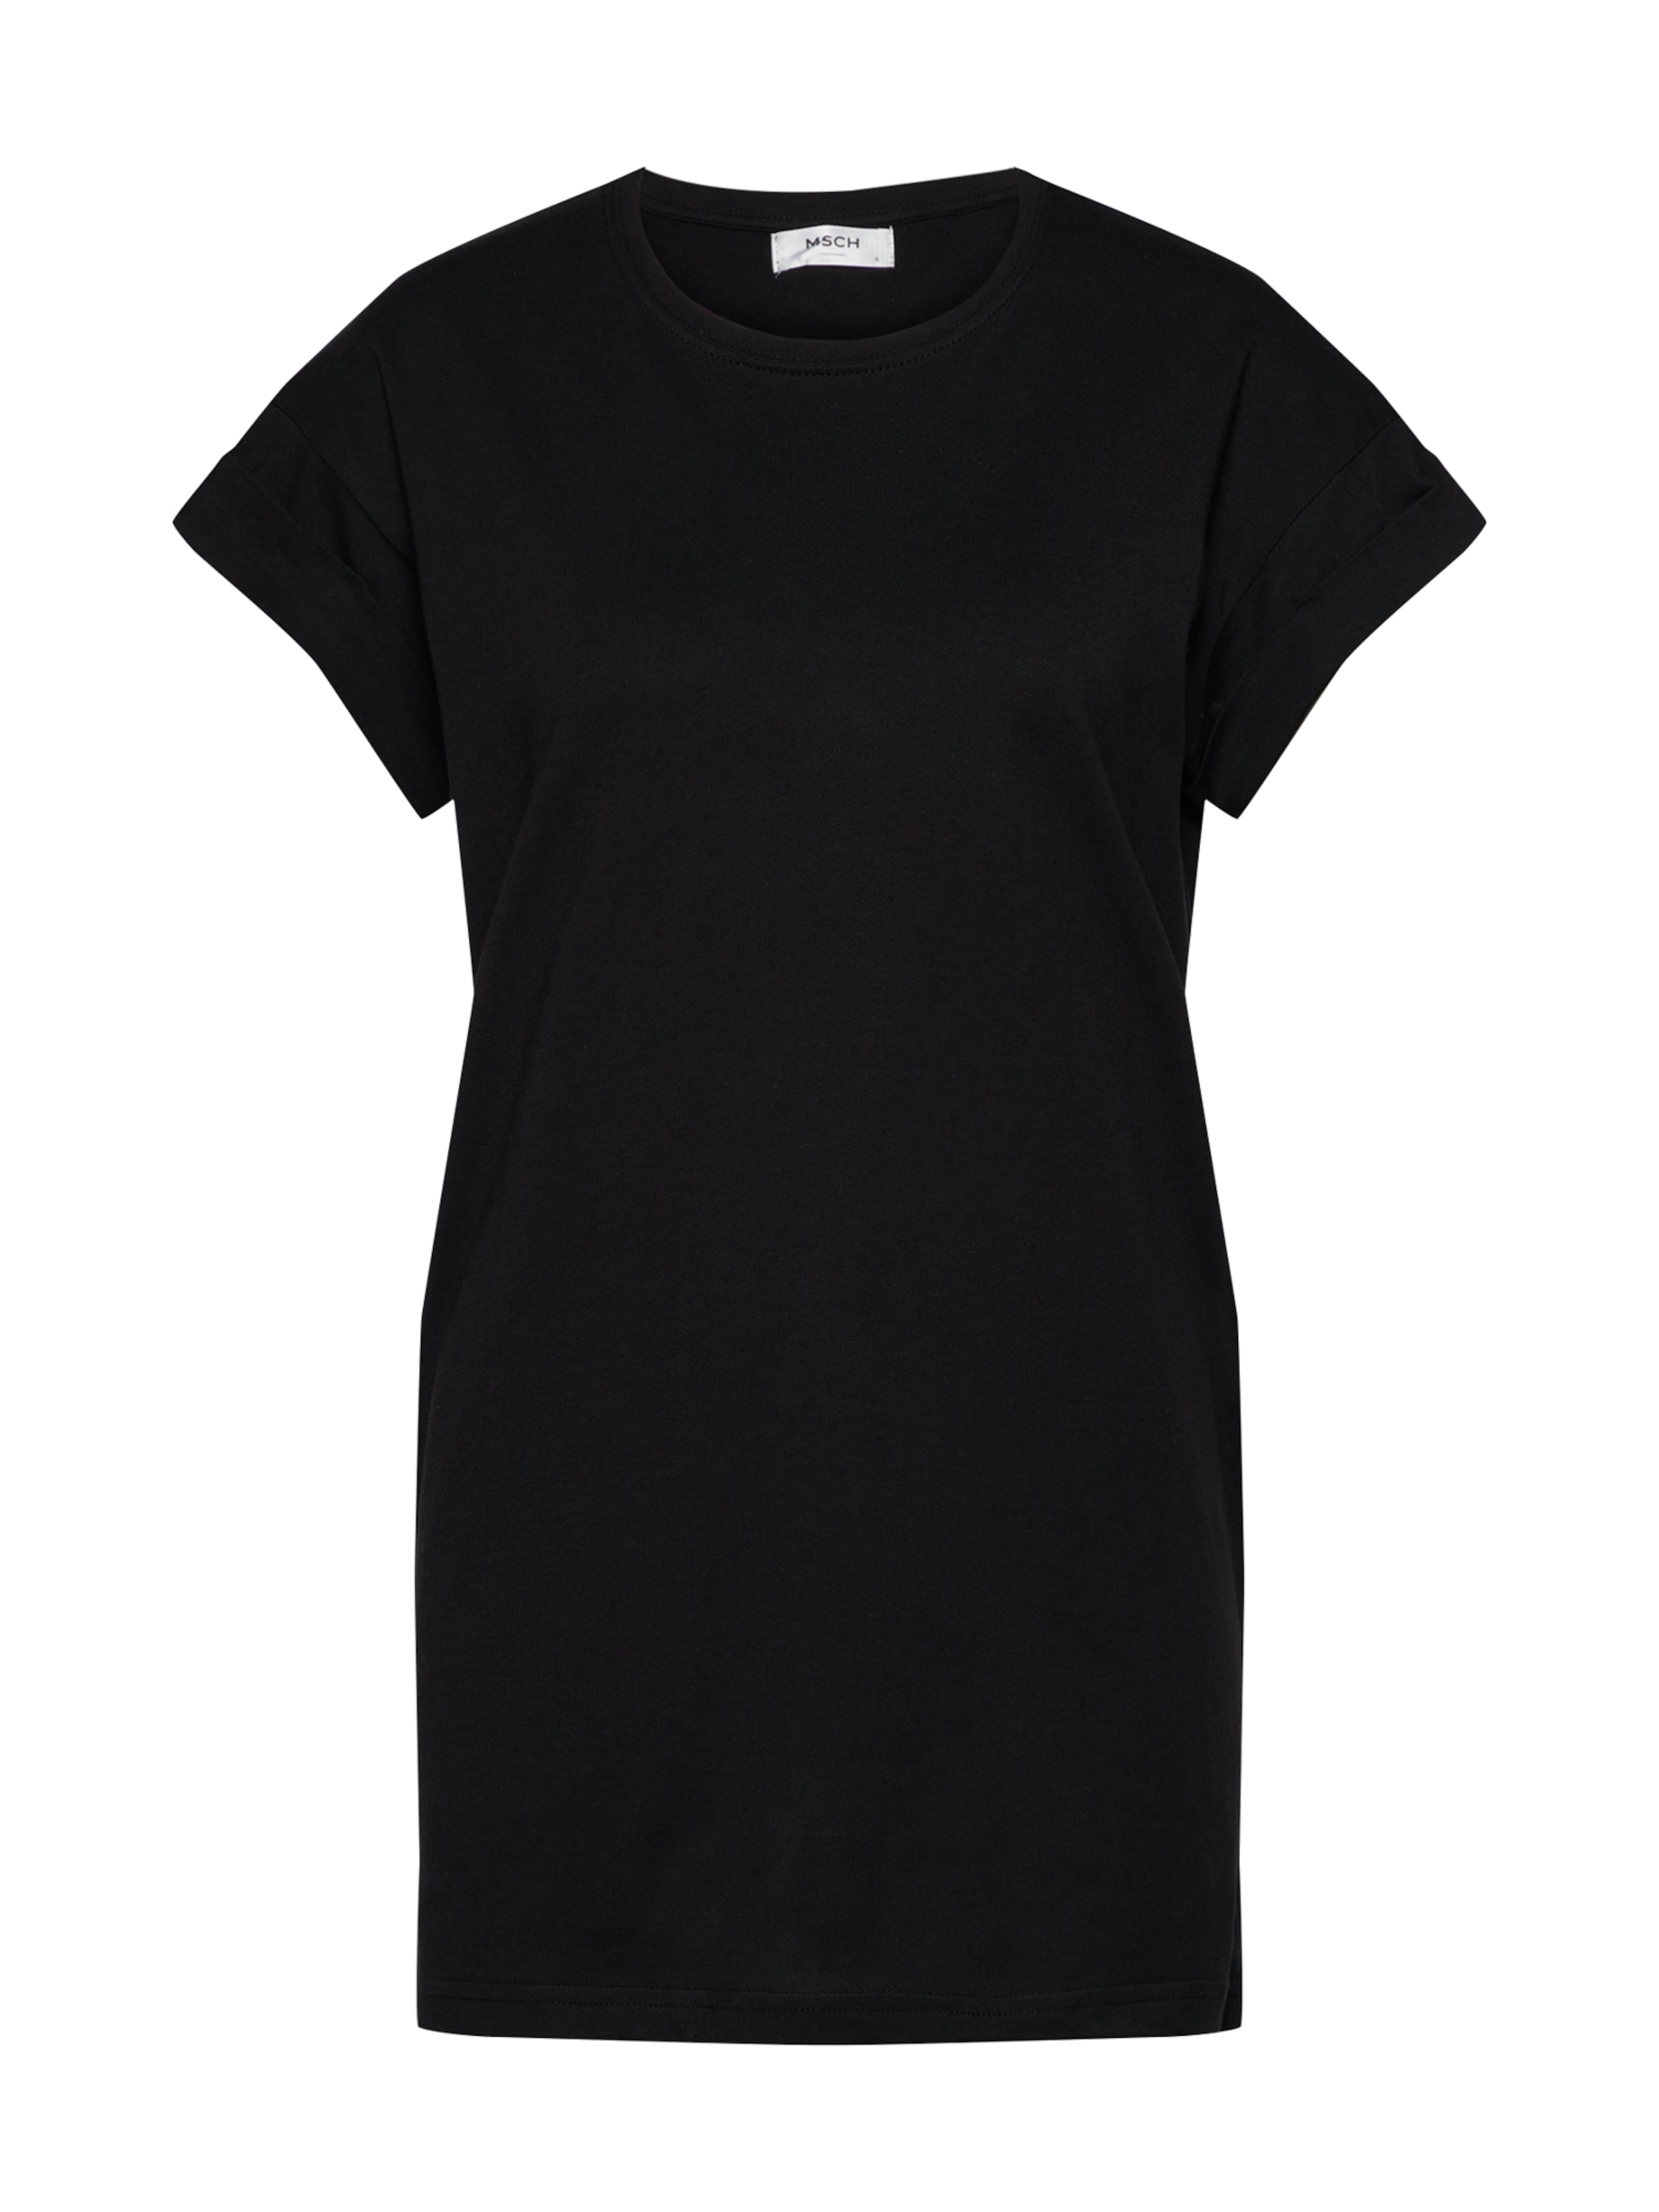 Plain' shirt Moss Noir En T 'alva Copenhagen g7fvIbmY6y